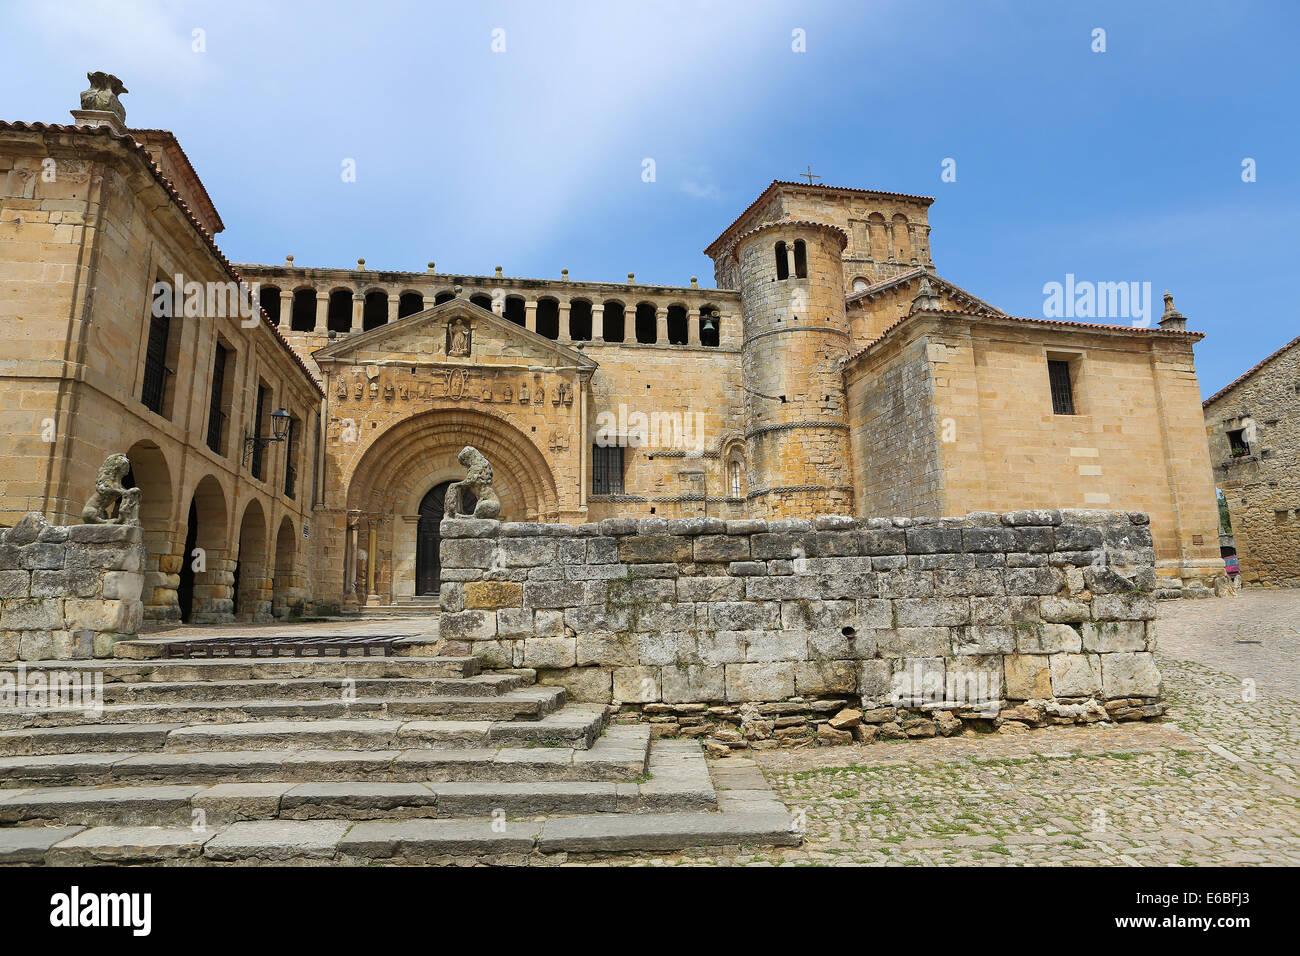 The Colegiata, a famous religious building in Santillana del Mar, a historic town in Cantabria, Spain. - Stock Image